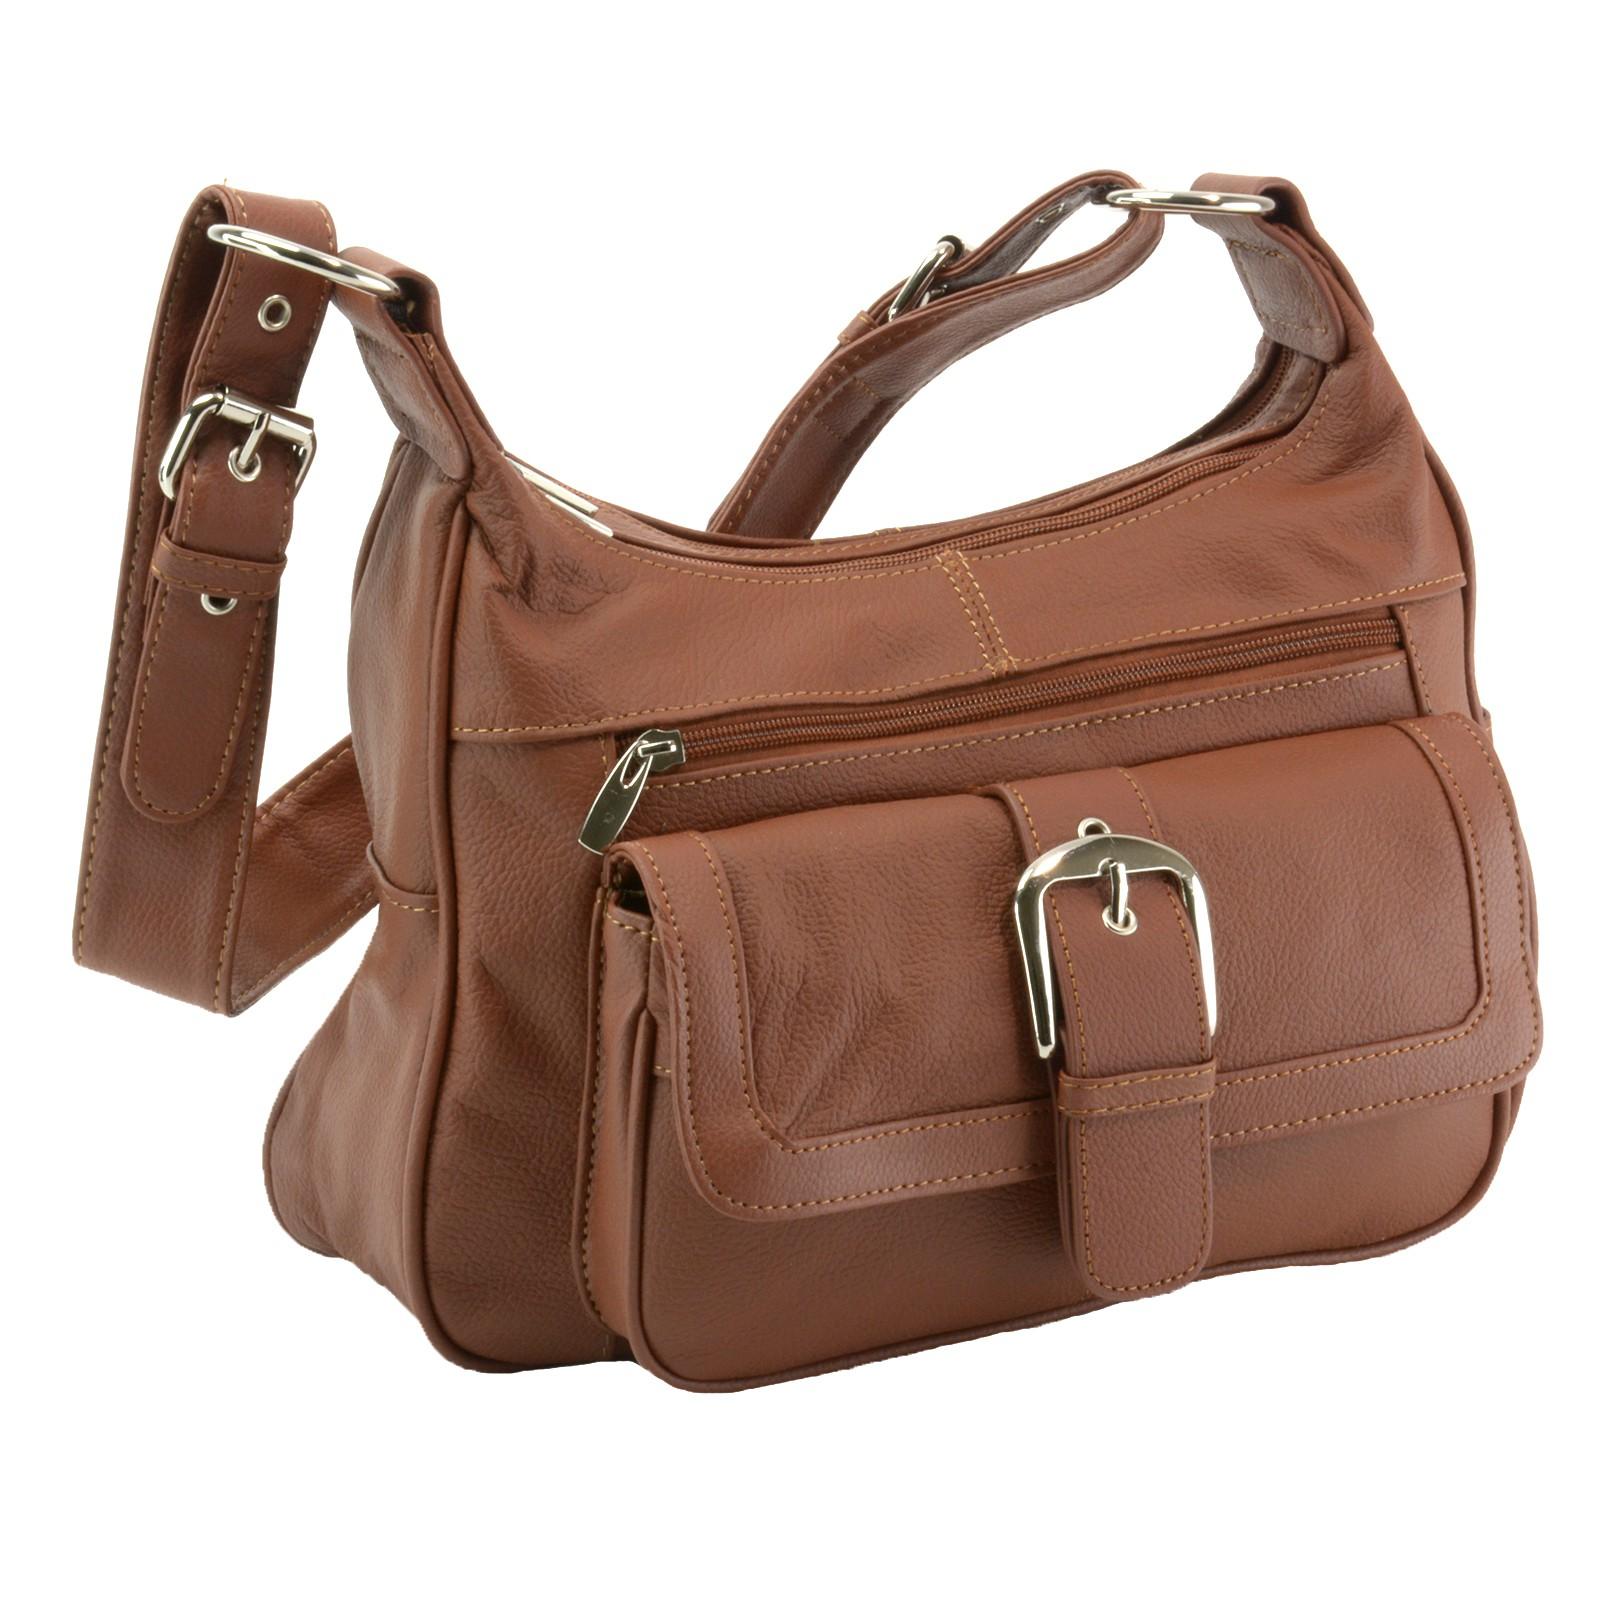 Women s Leather Organizer Purse Multi Pocket Handbag Shoulder Bag Satchel  Tote d5b7d3e3e7